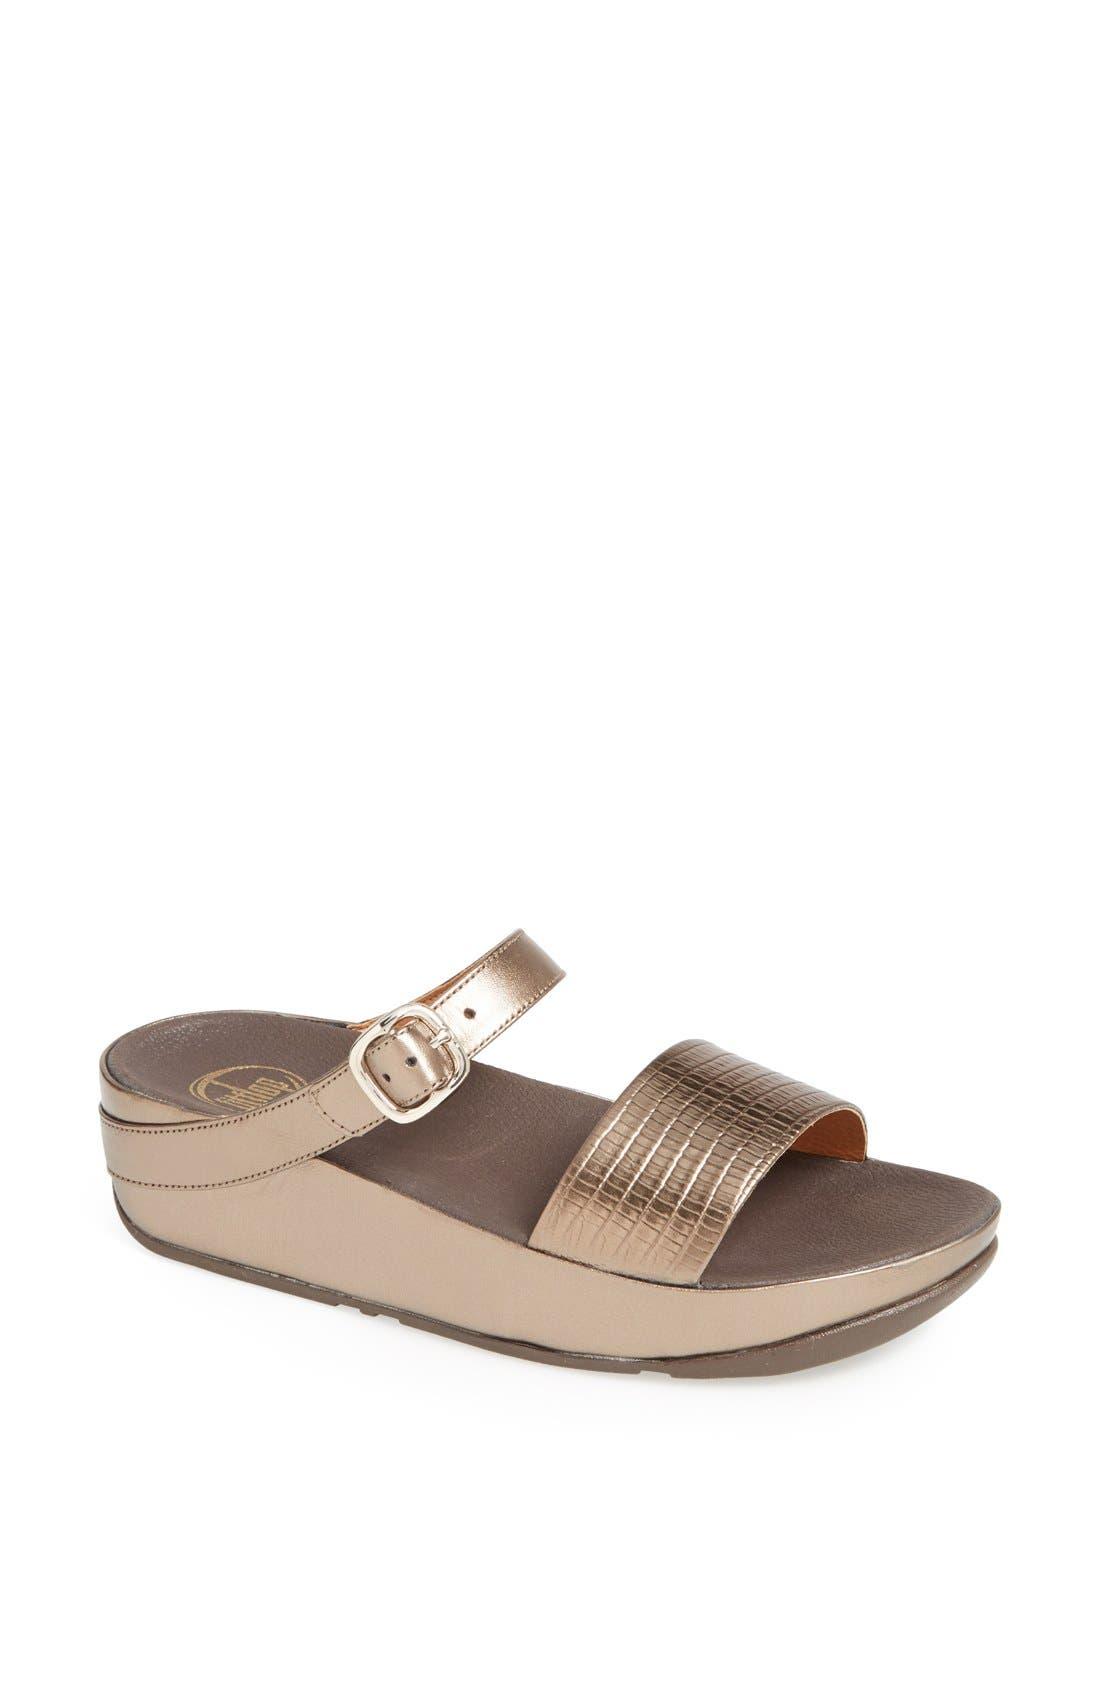 Main Image - FitFlop 'Souza™' Sandal